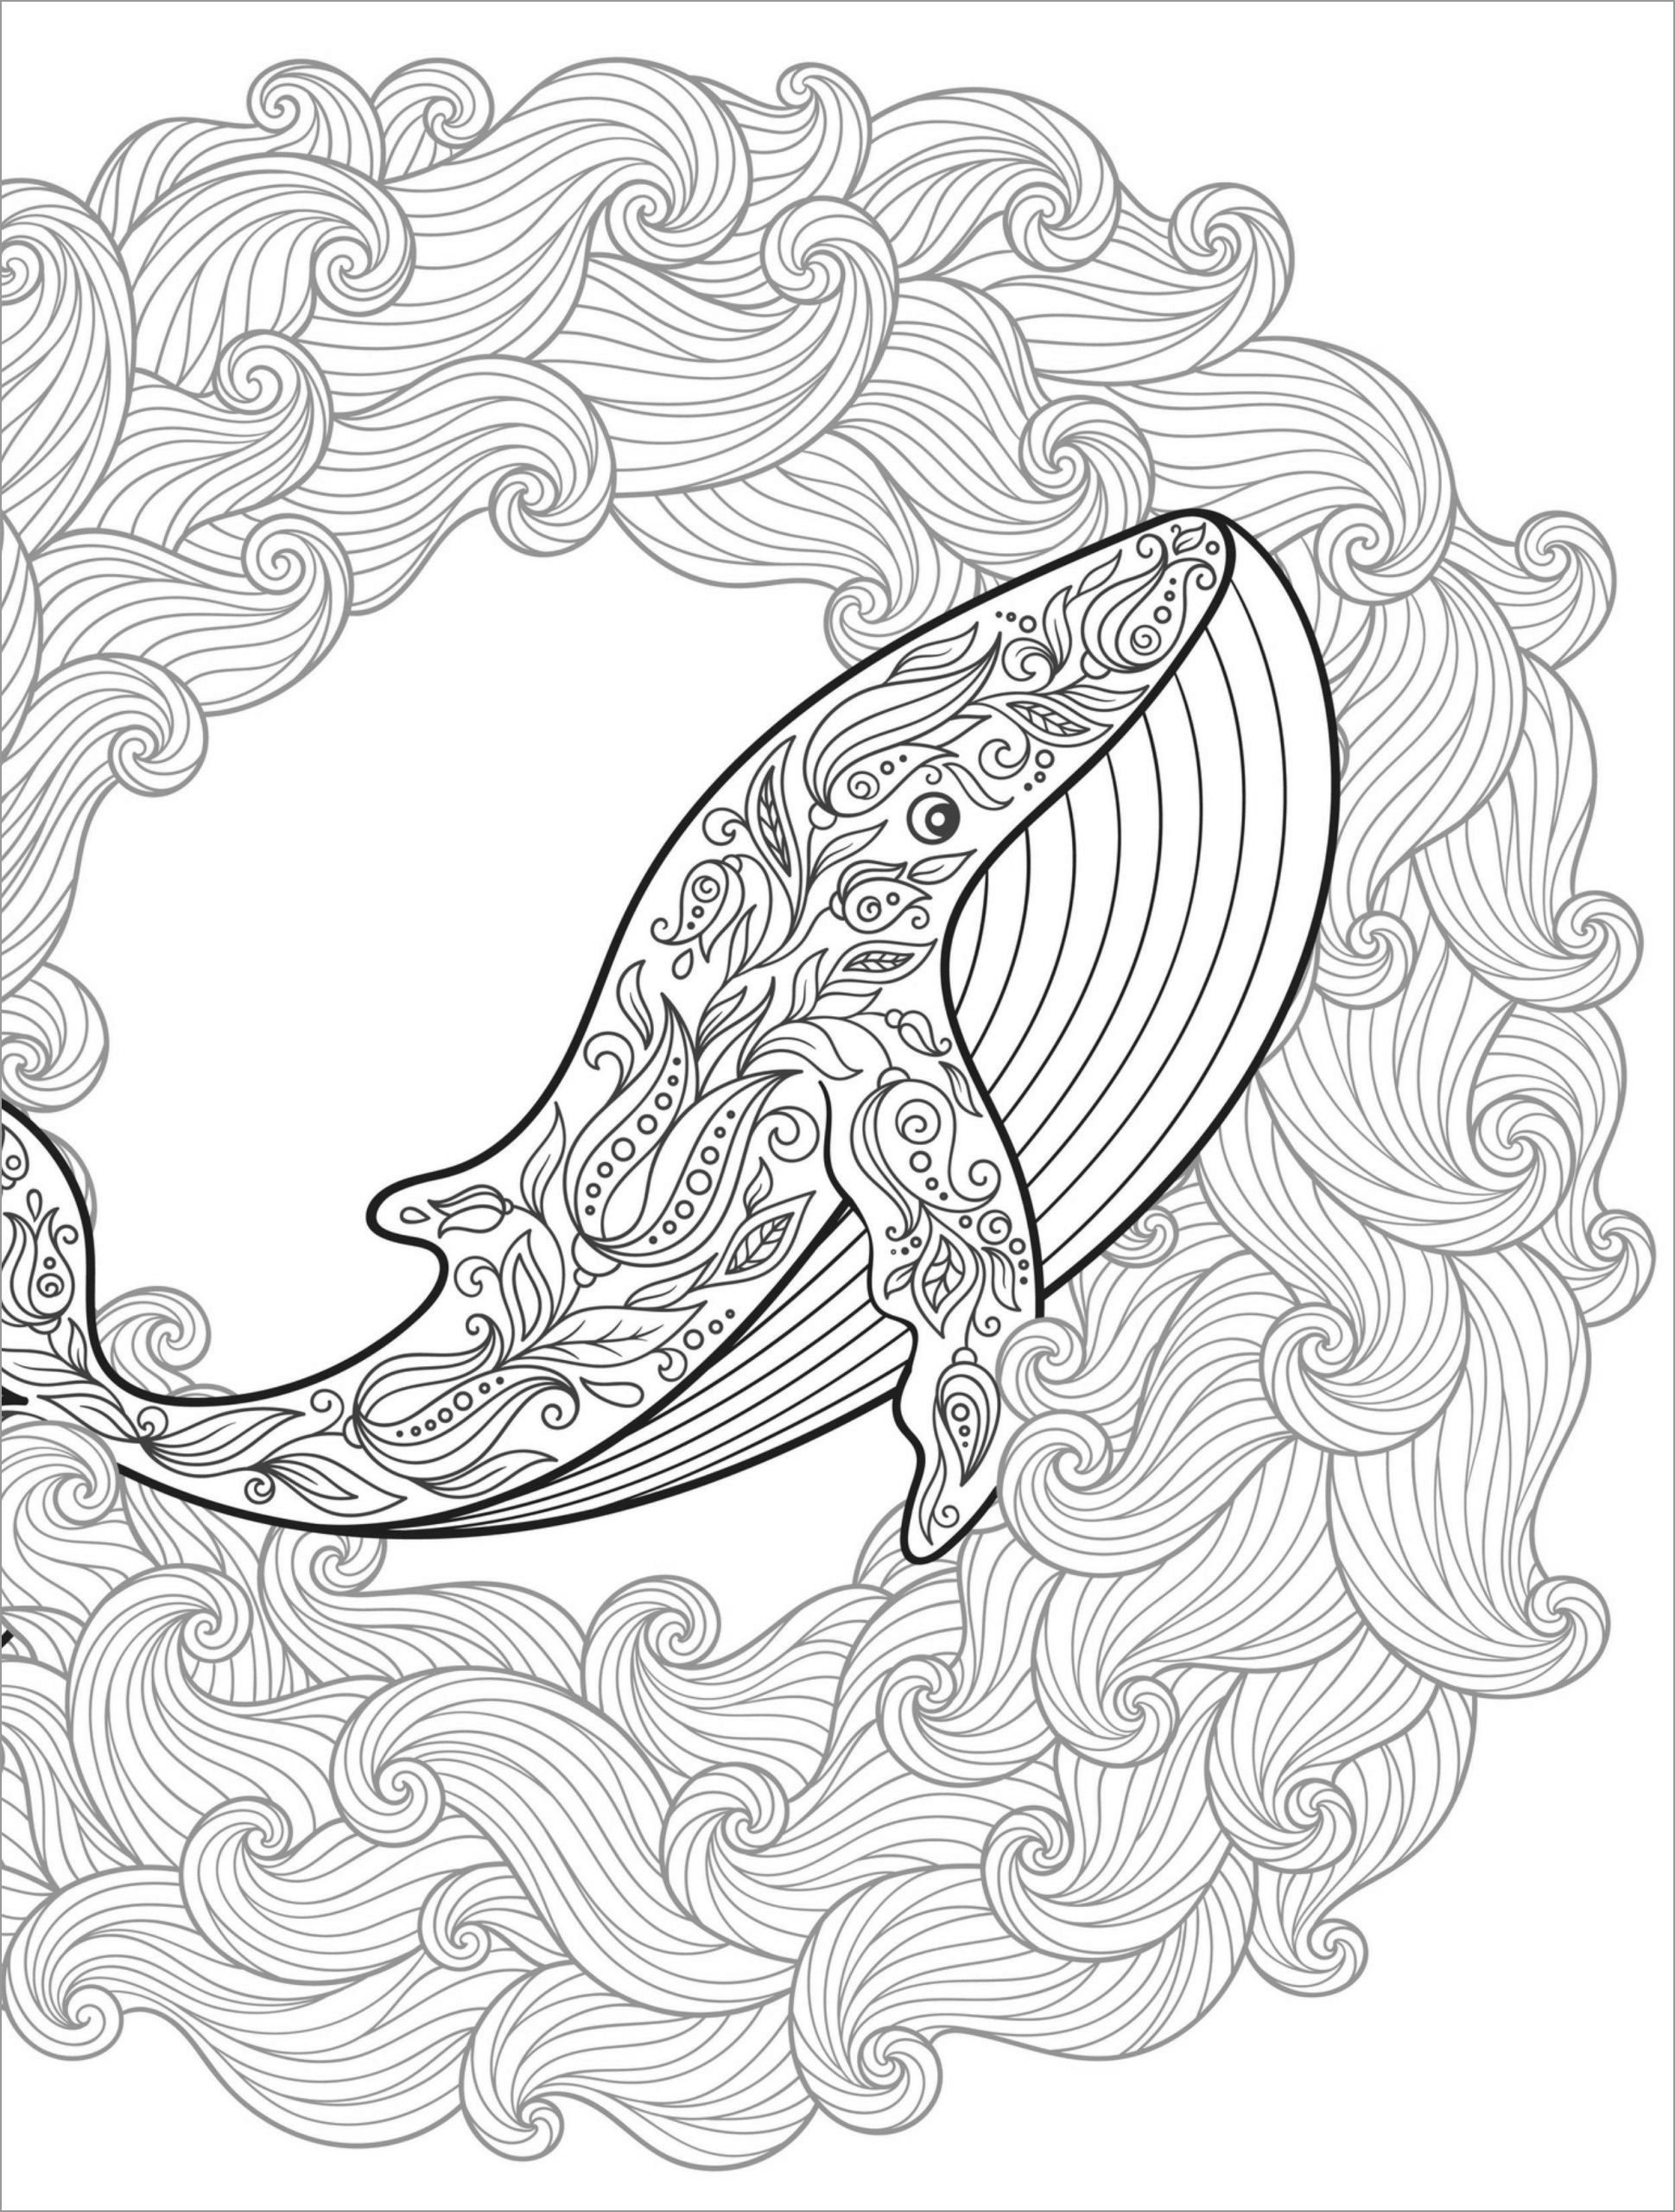 Blue Whale Mandala Coloring Page